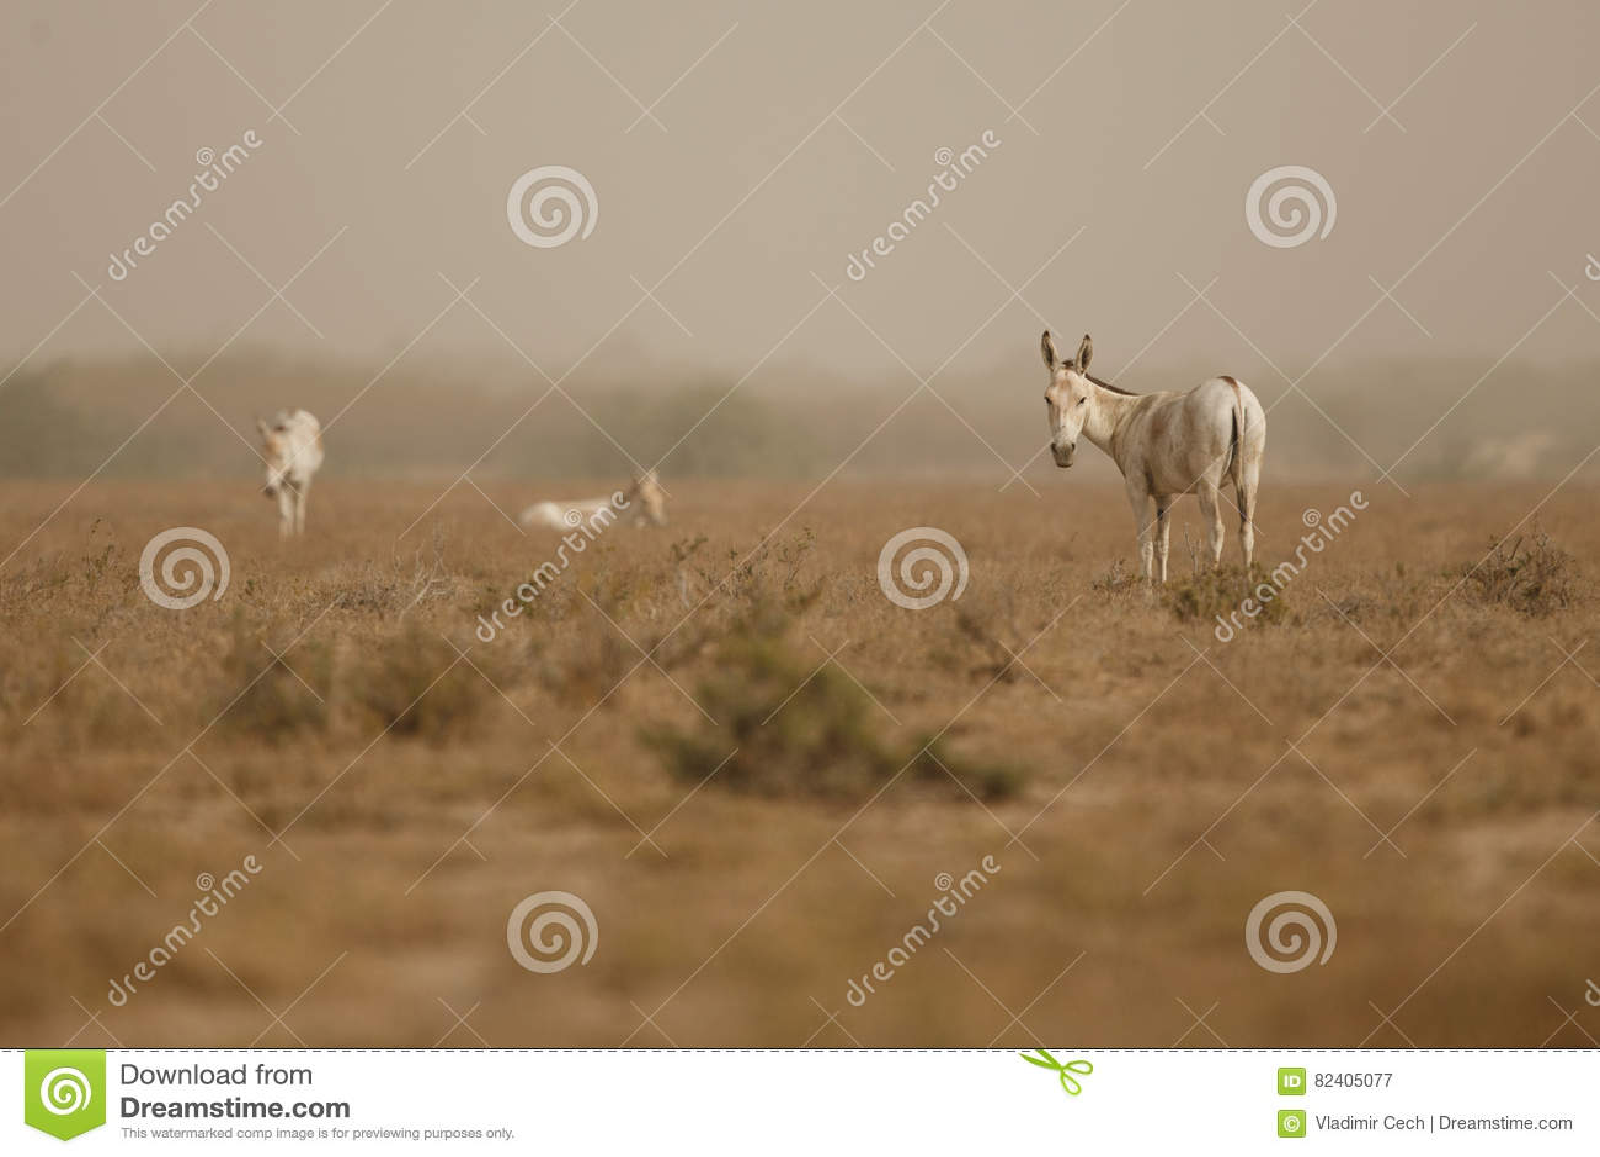 Very wild males